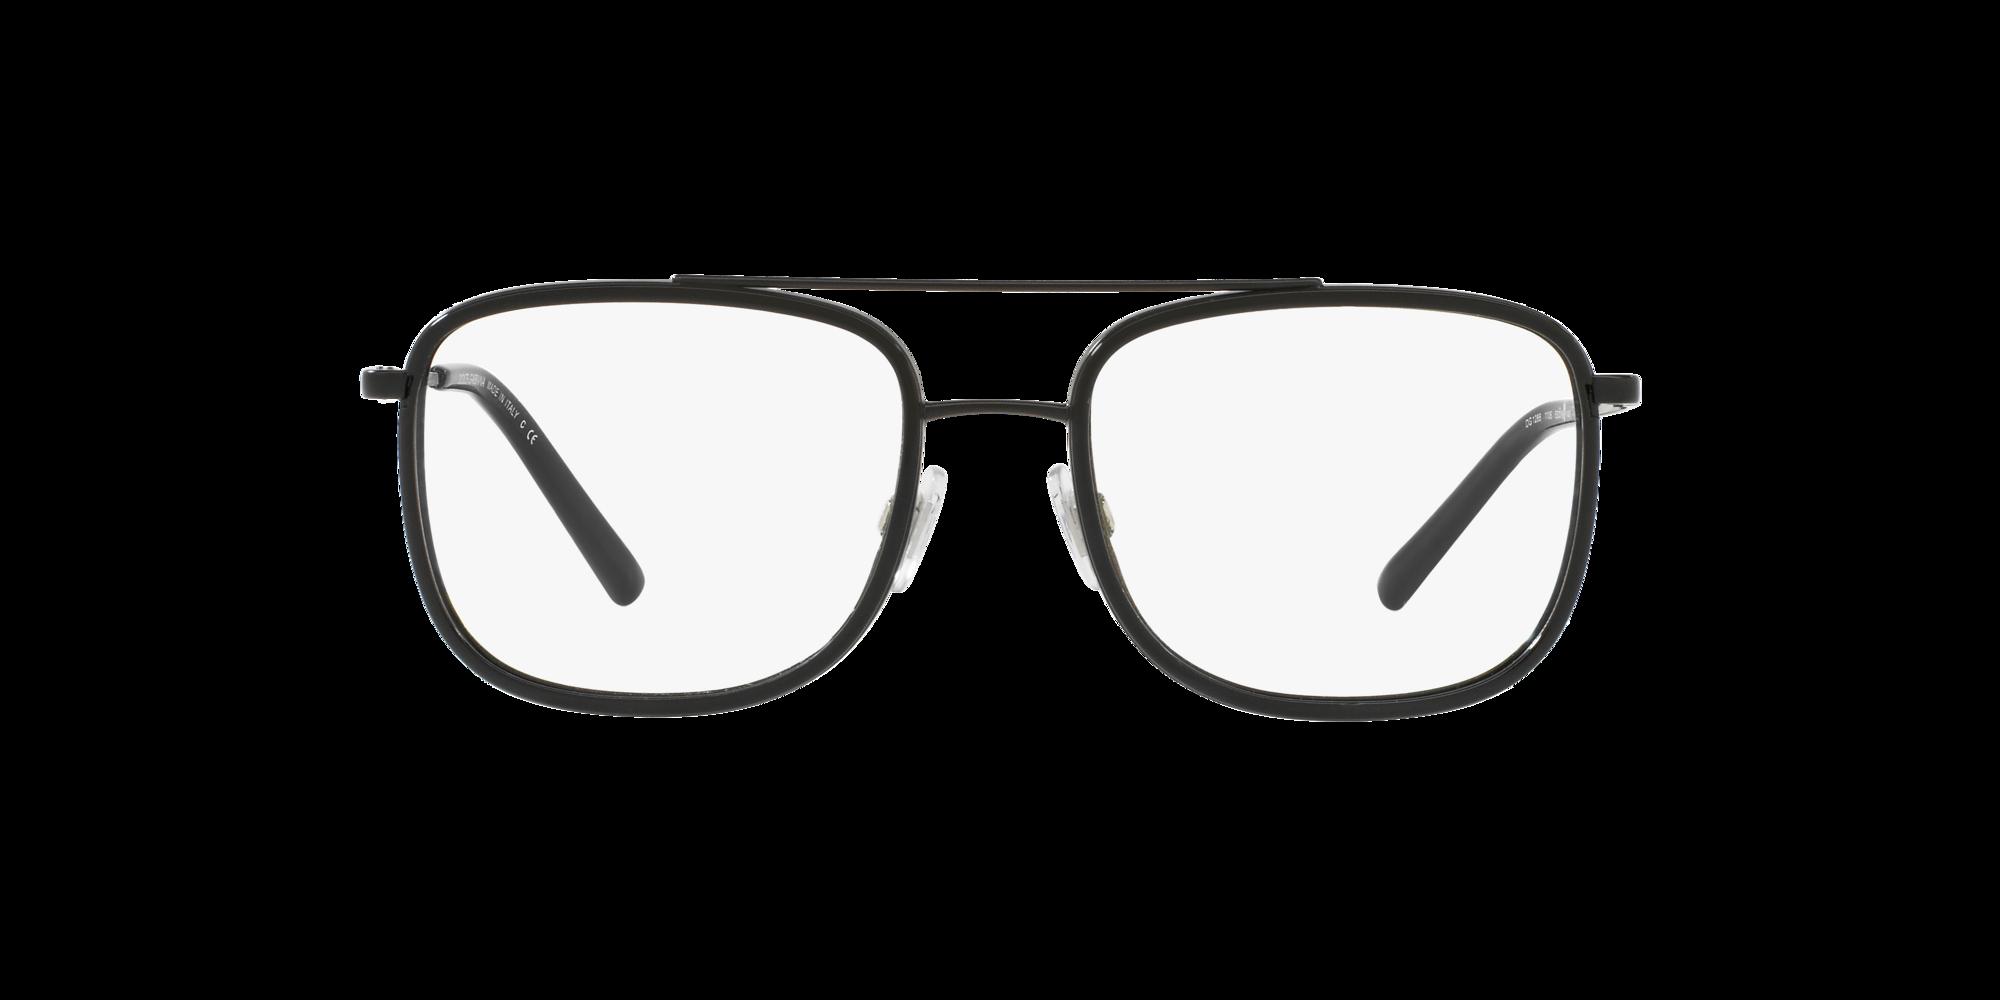 Image for DG1288 from LensCrafters | Glasses, Prescription Glasses Online, Eyewear